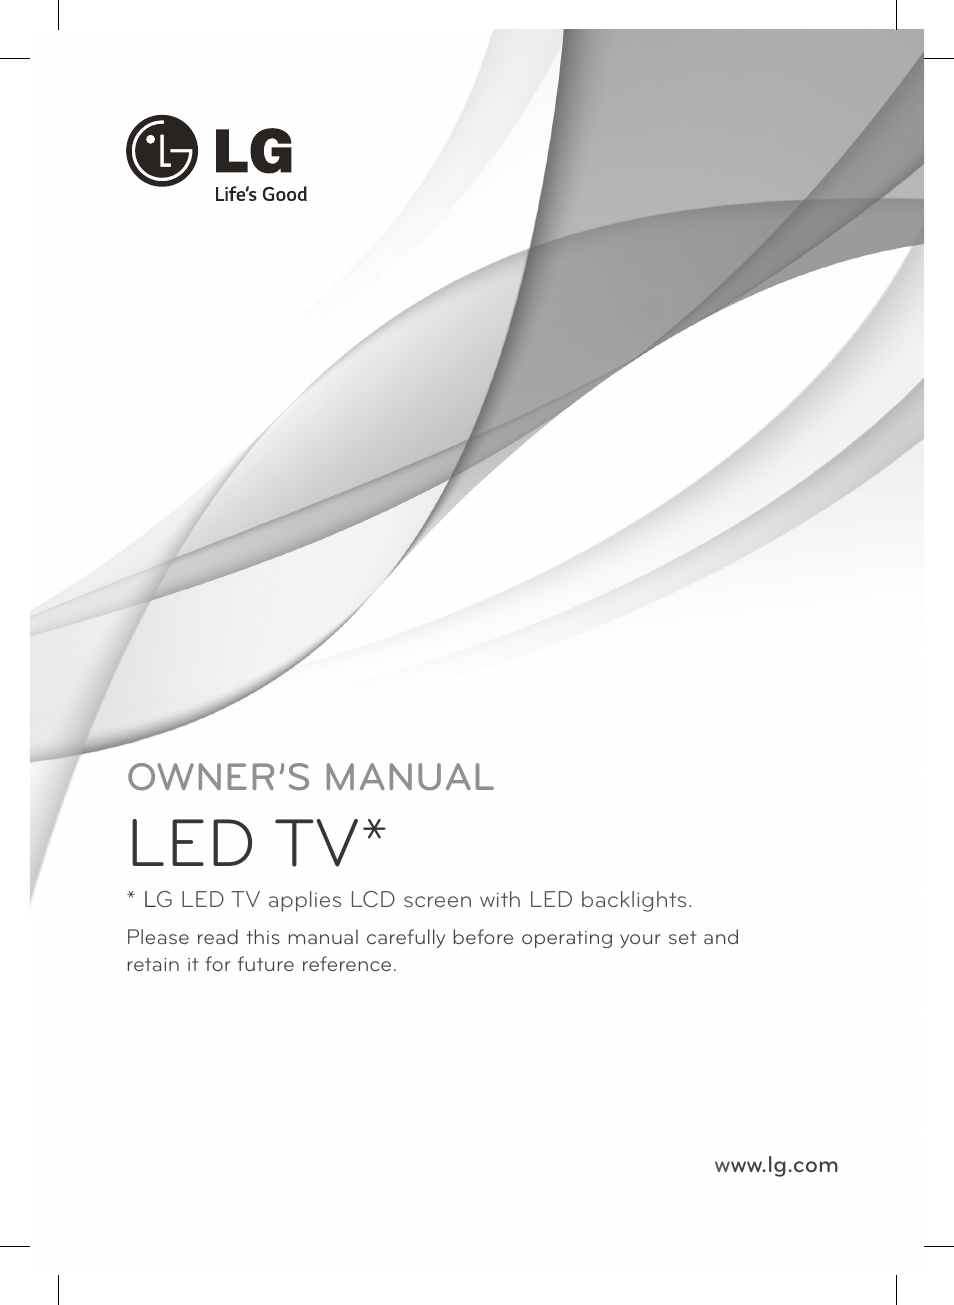 01 eng led tv owner s manual lg 55lb561v user manual page 25 rh manualsdir com lg lcd service manual lg led tv owner's manual